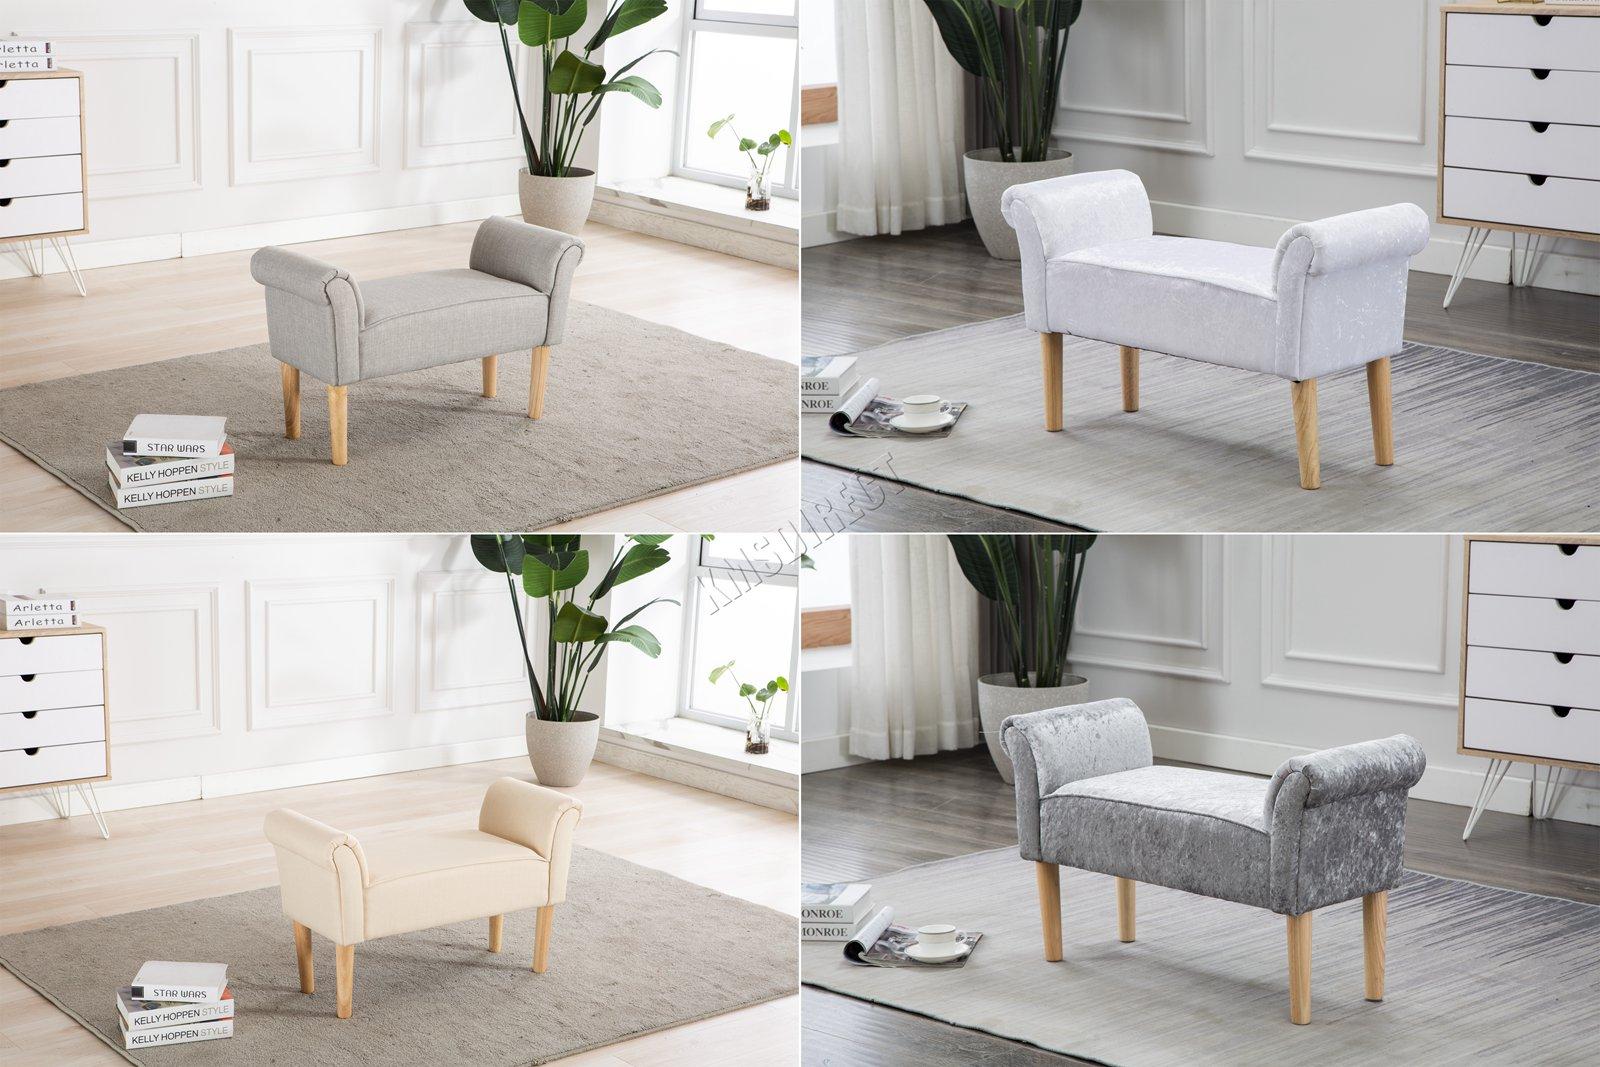 FoxHunter Fabric Bench Footstool Seat Pouf Pouffee Ottoman Stool Bedroom  Lounge